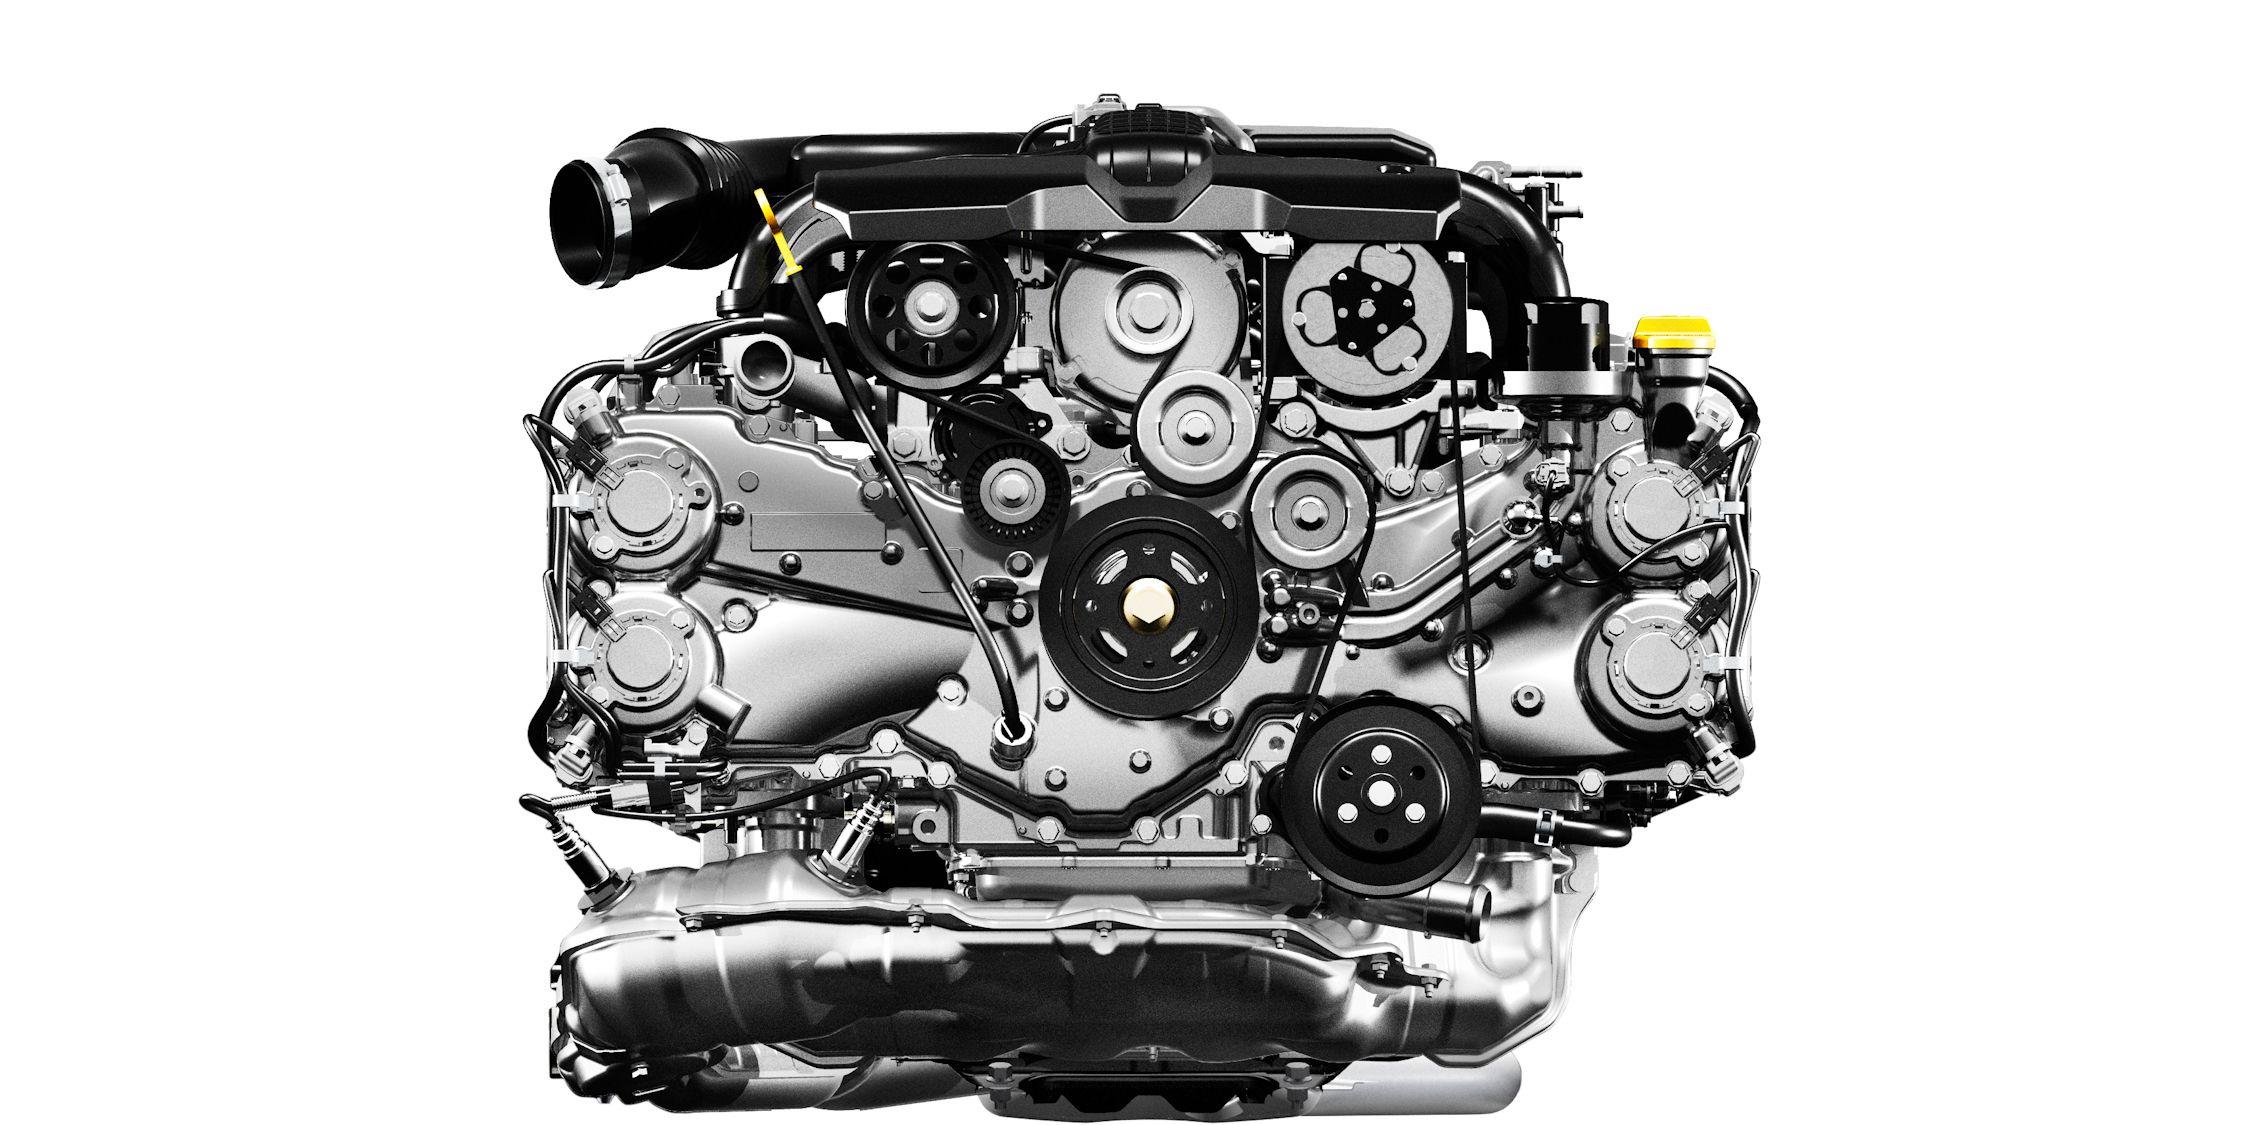 Subaru Fb Series Engine Subaru Flat Four Engines Car And Driver Photo S Original